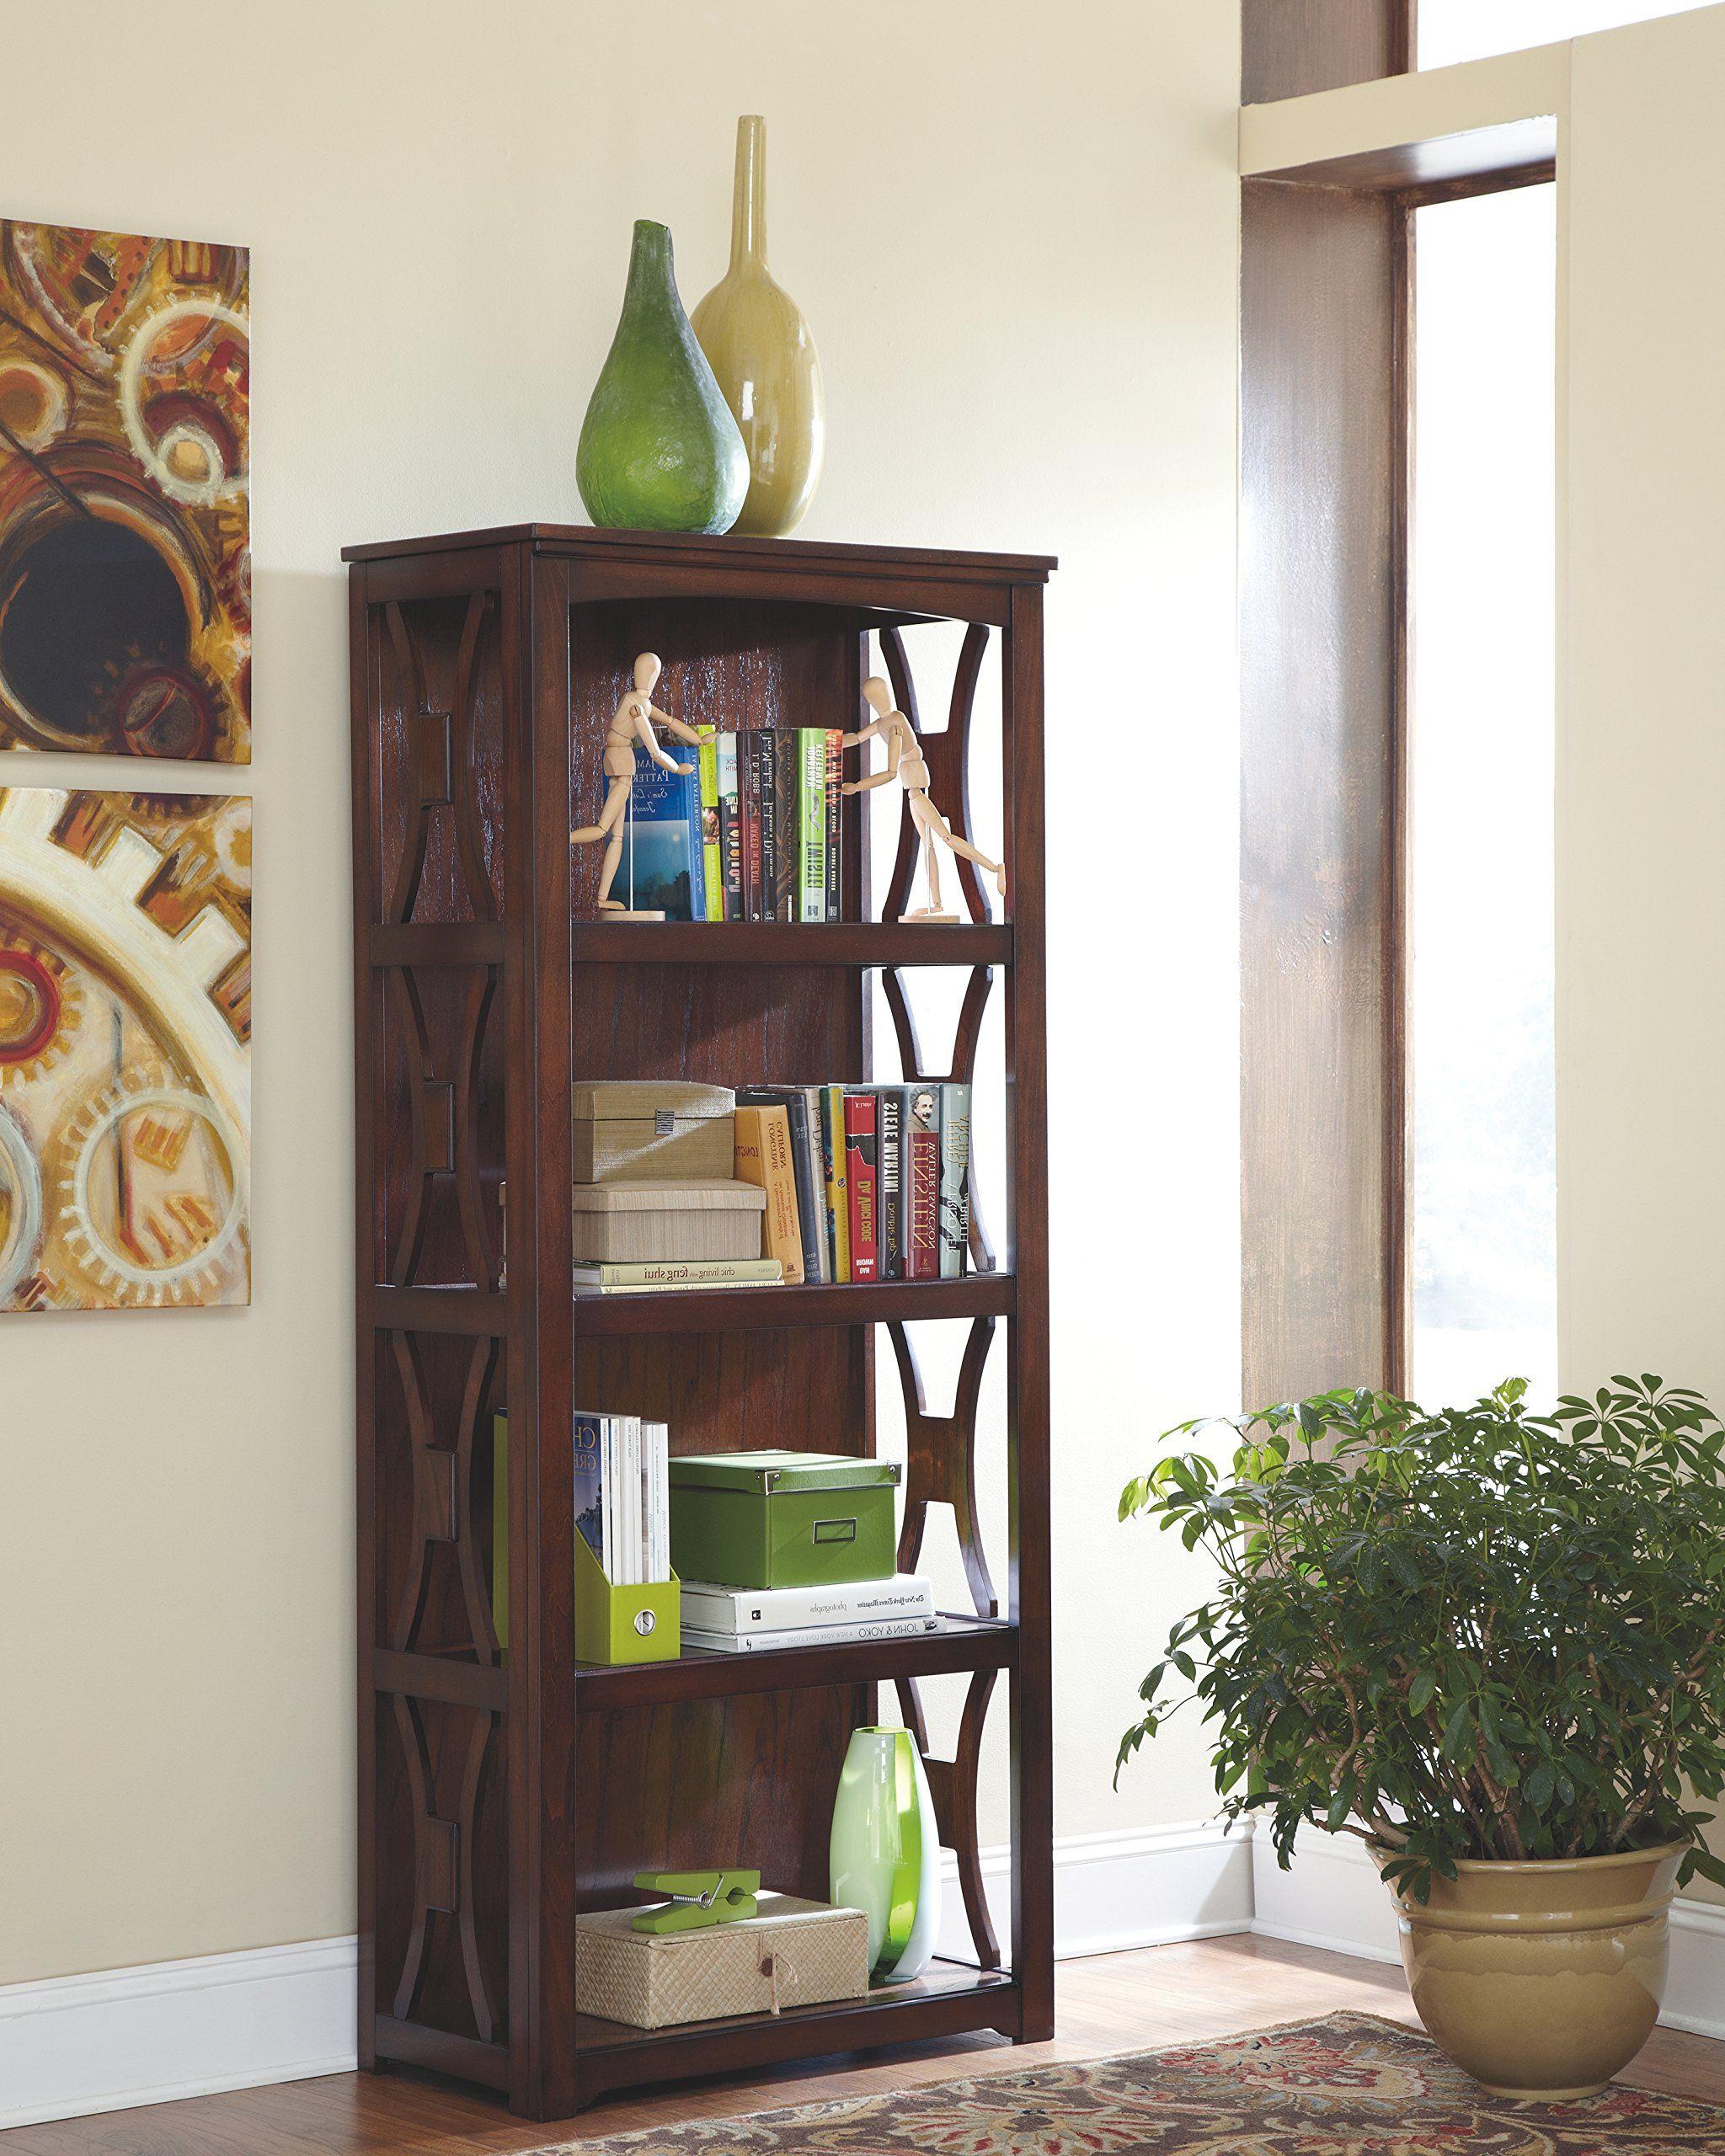 Ashley Furniture Signature Design Devrik Bookcase 4 Shelves Curved